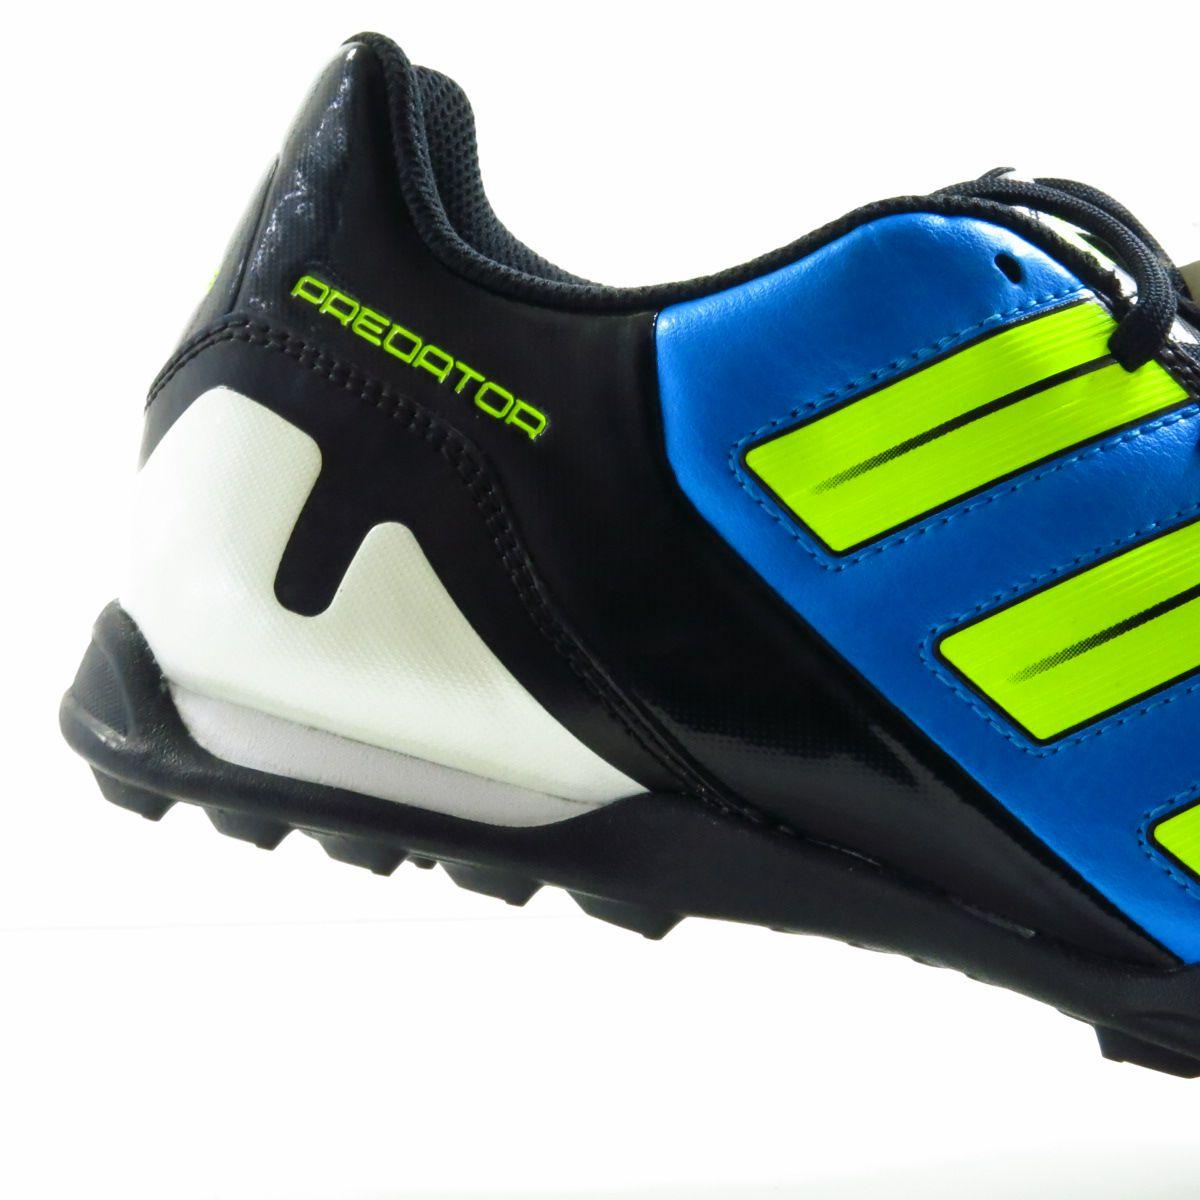 Chuteira Adidas Predator Predito TF Society